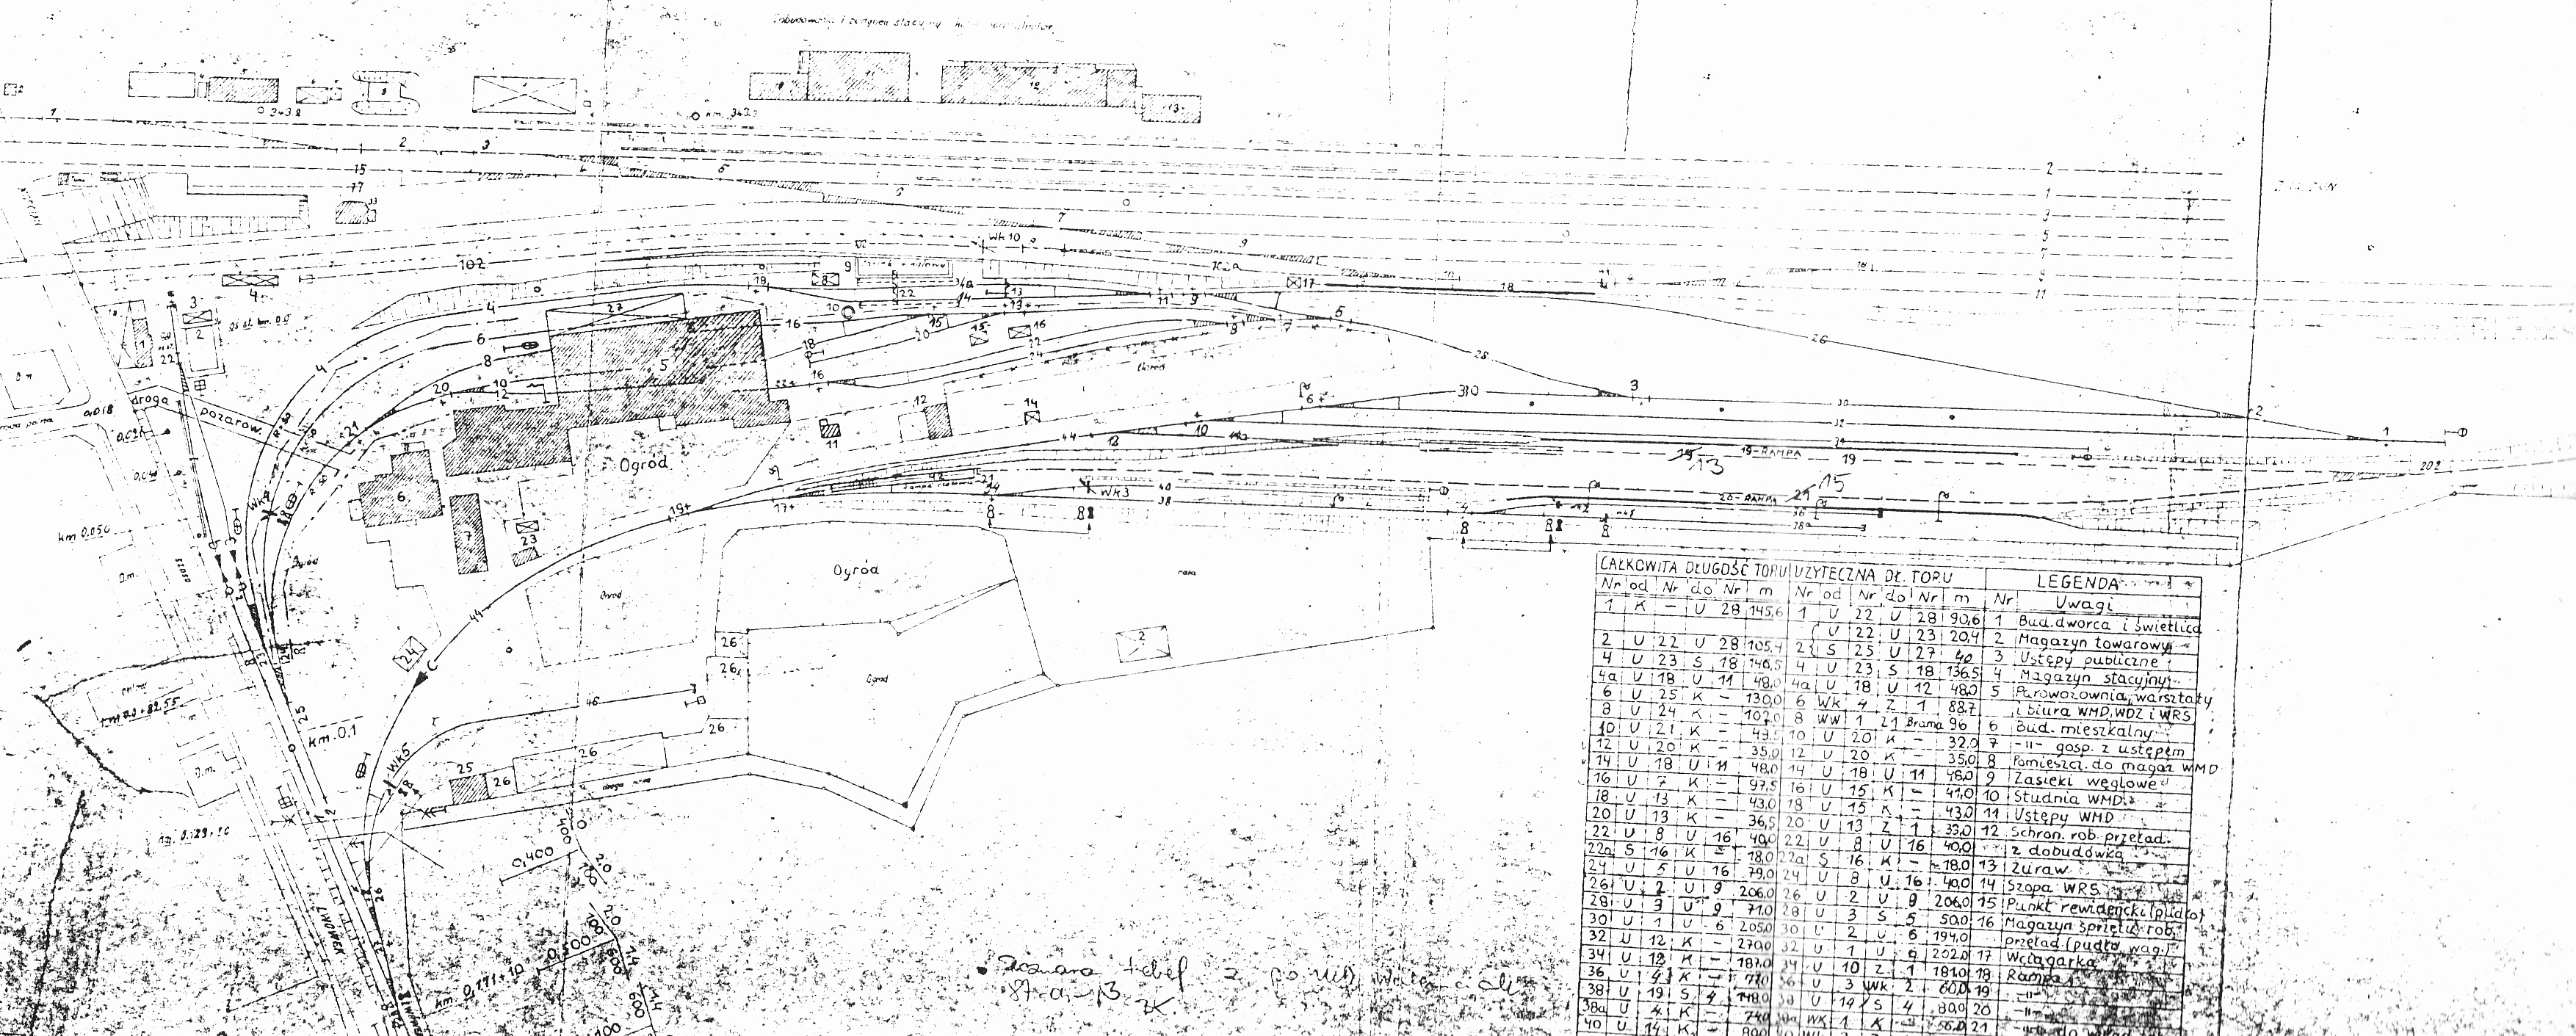 Opalenica_Gleisplan_1983.jpg